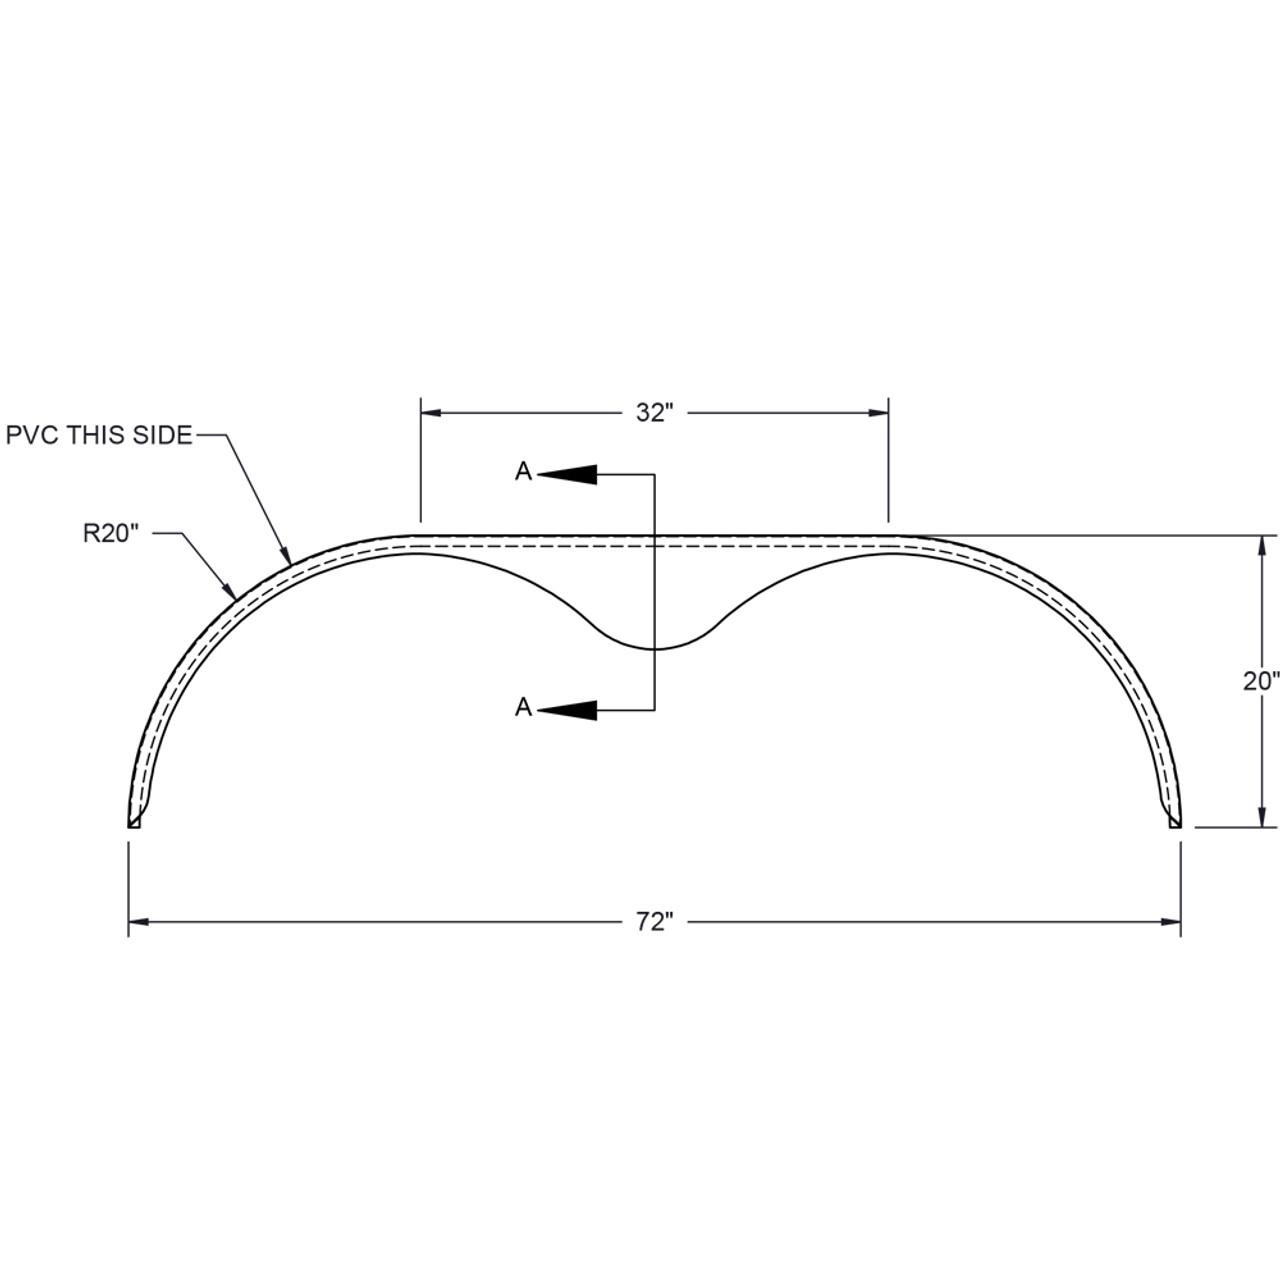 72x9 Smooth Aluminum Tandem-Axle Teardrop Trailer Fender - One Fender